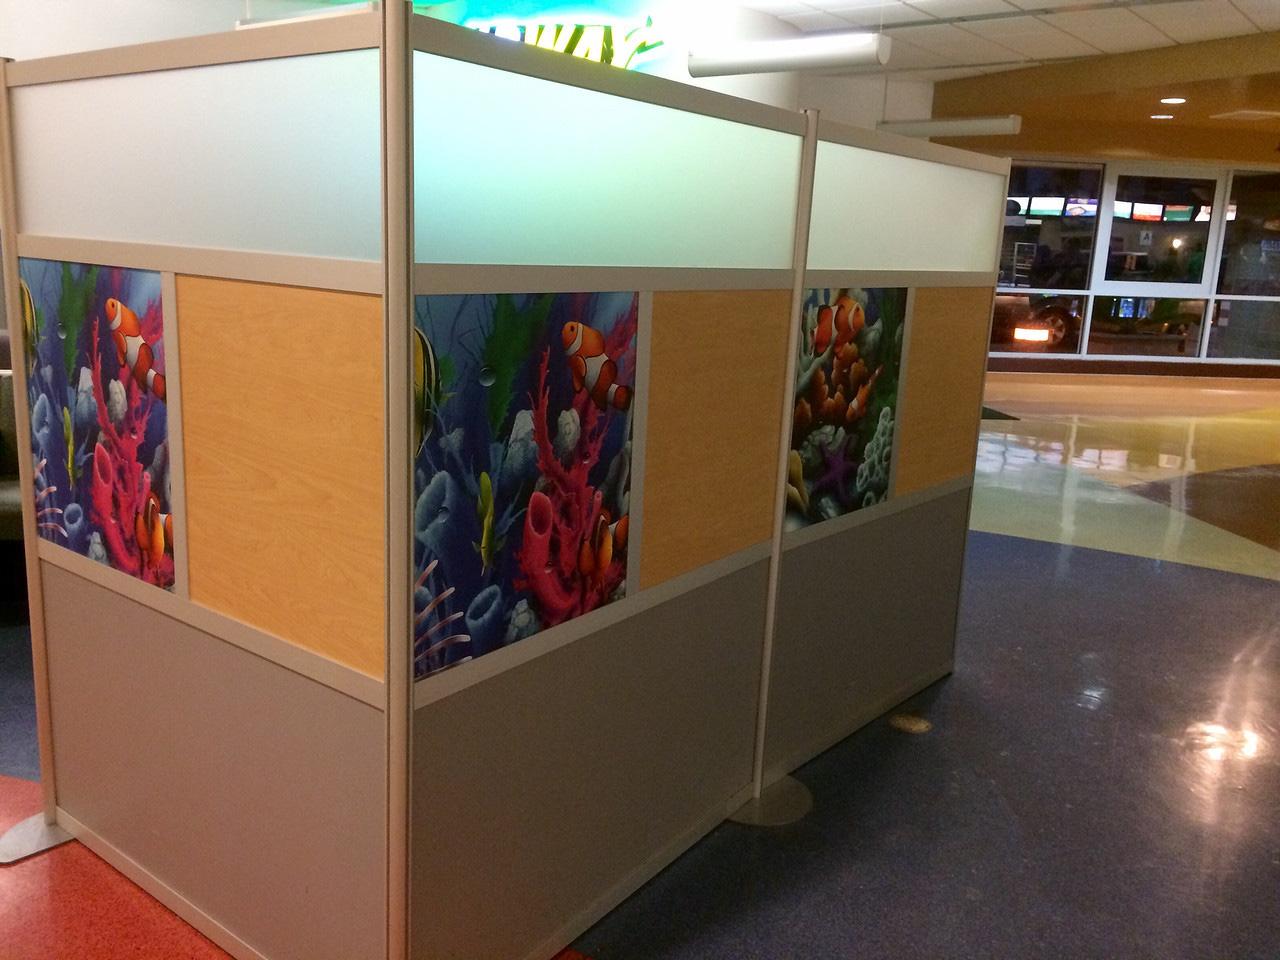 furniture-cubicles-in-daytona-beach-florida.jpg